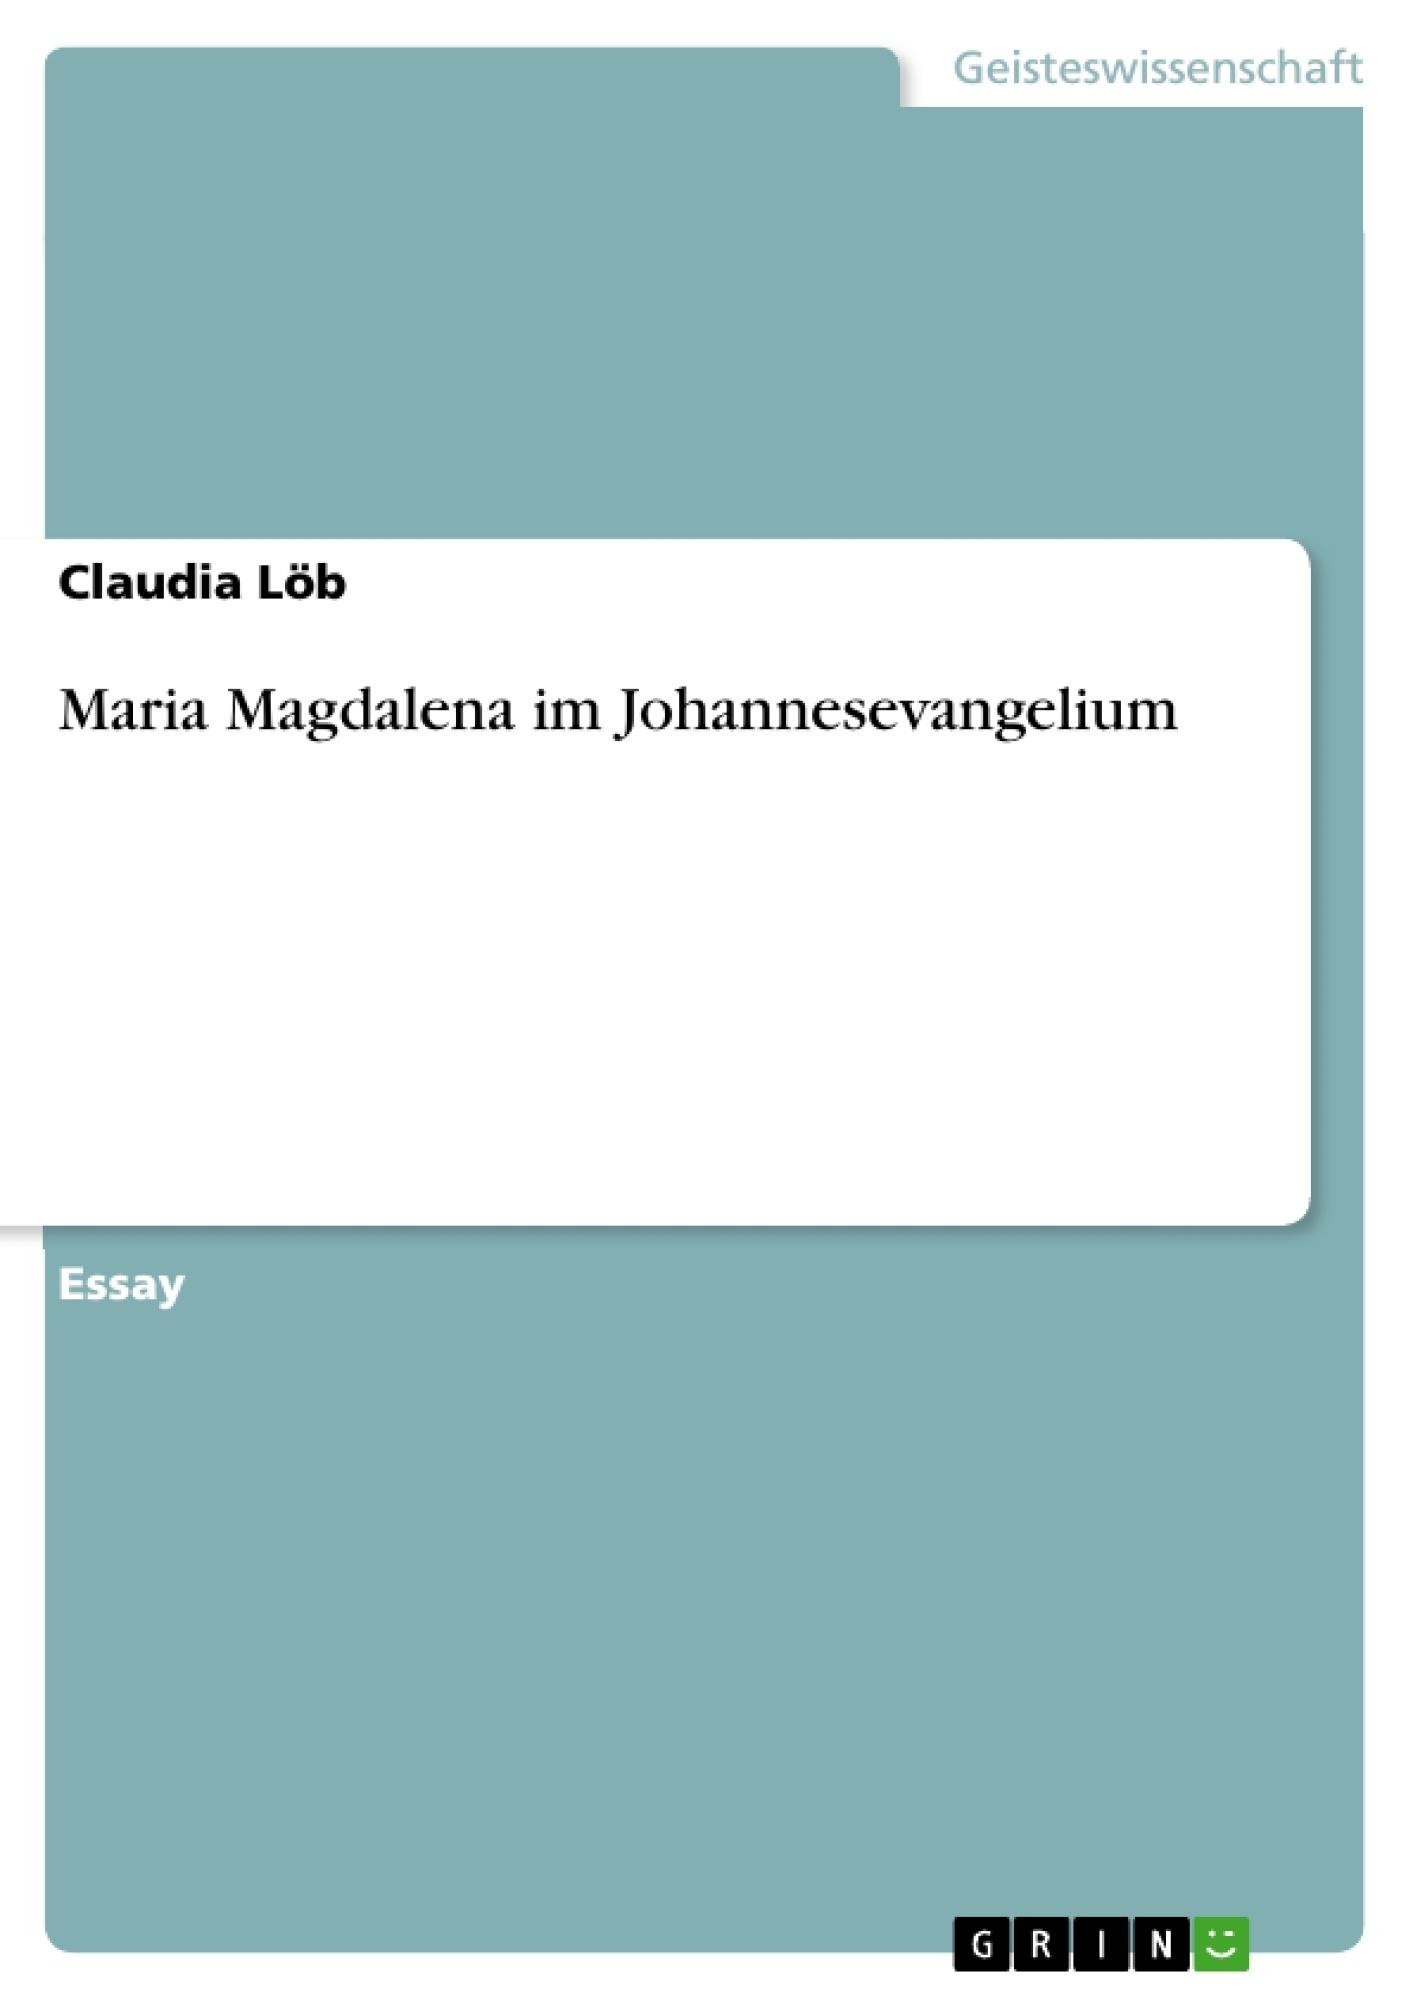 Titel: Maria Magdalena im Johannesevangelium